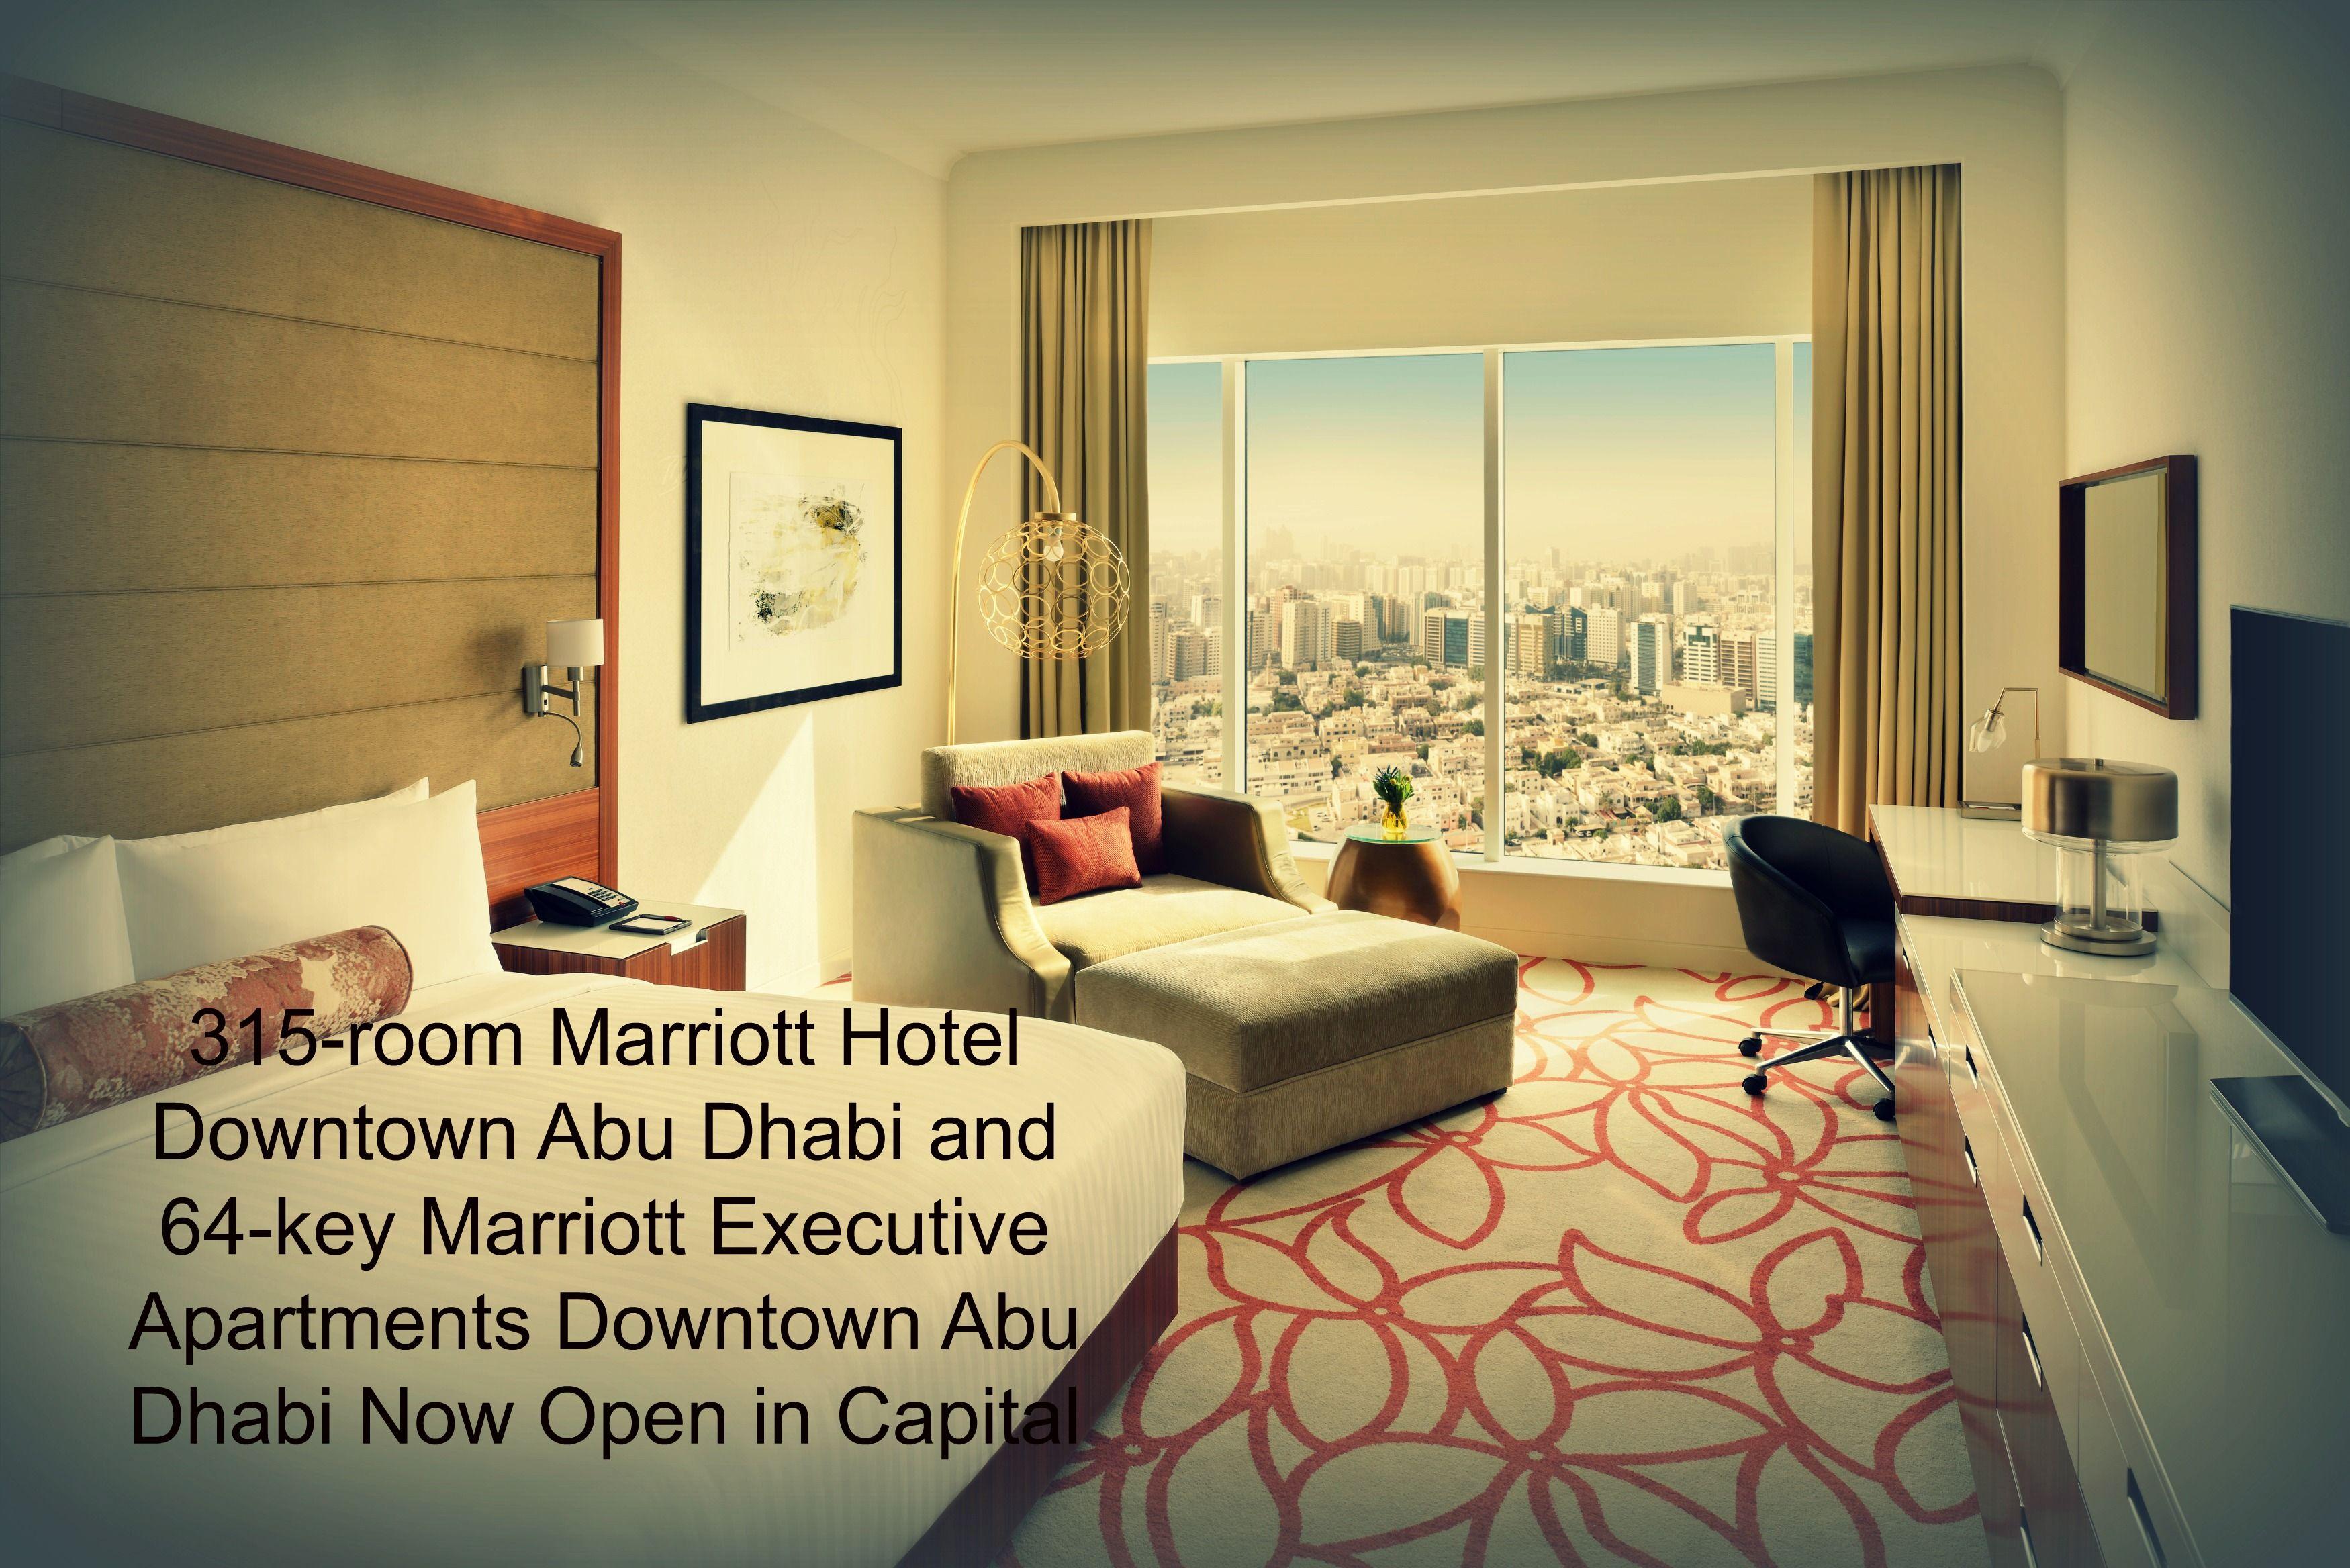 315 Room Marriott Hotel Downtown Abu Dhabi And 64 Key Marriott Executive Apartments Downtown Abu Downtown Apartment Real Estate Articles Real Estate Investing